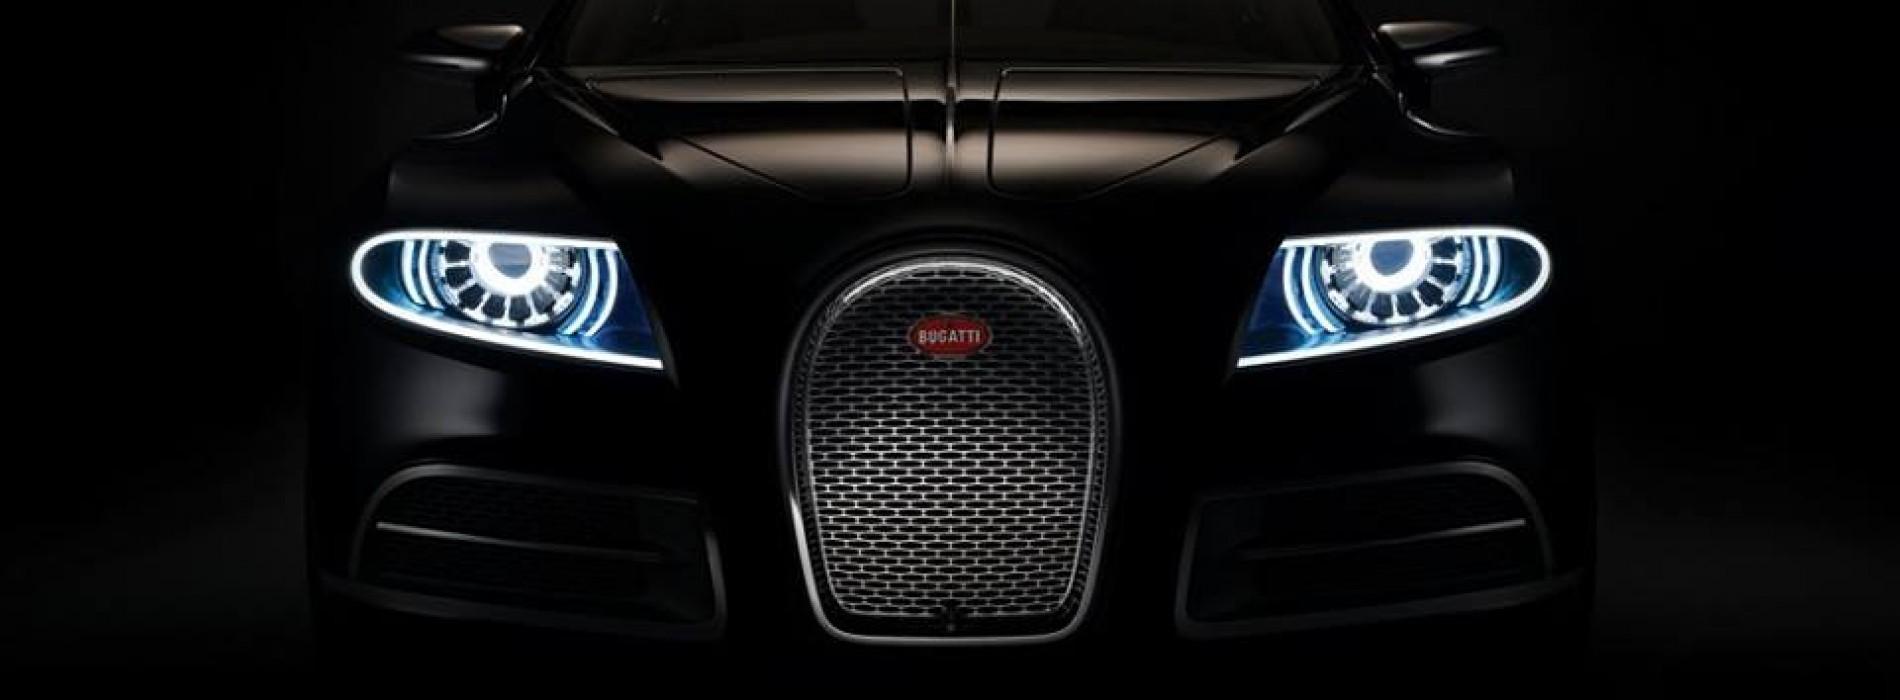 Bugatti 16C Galibier подарък за Коледа